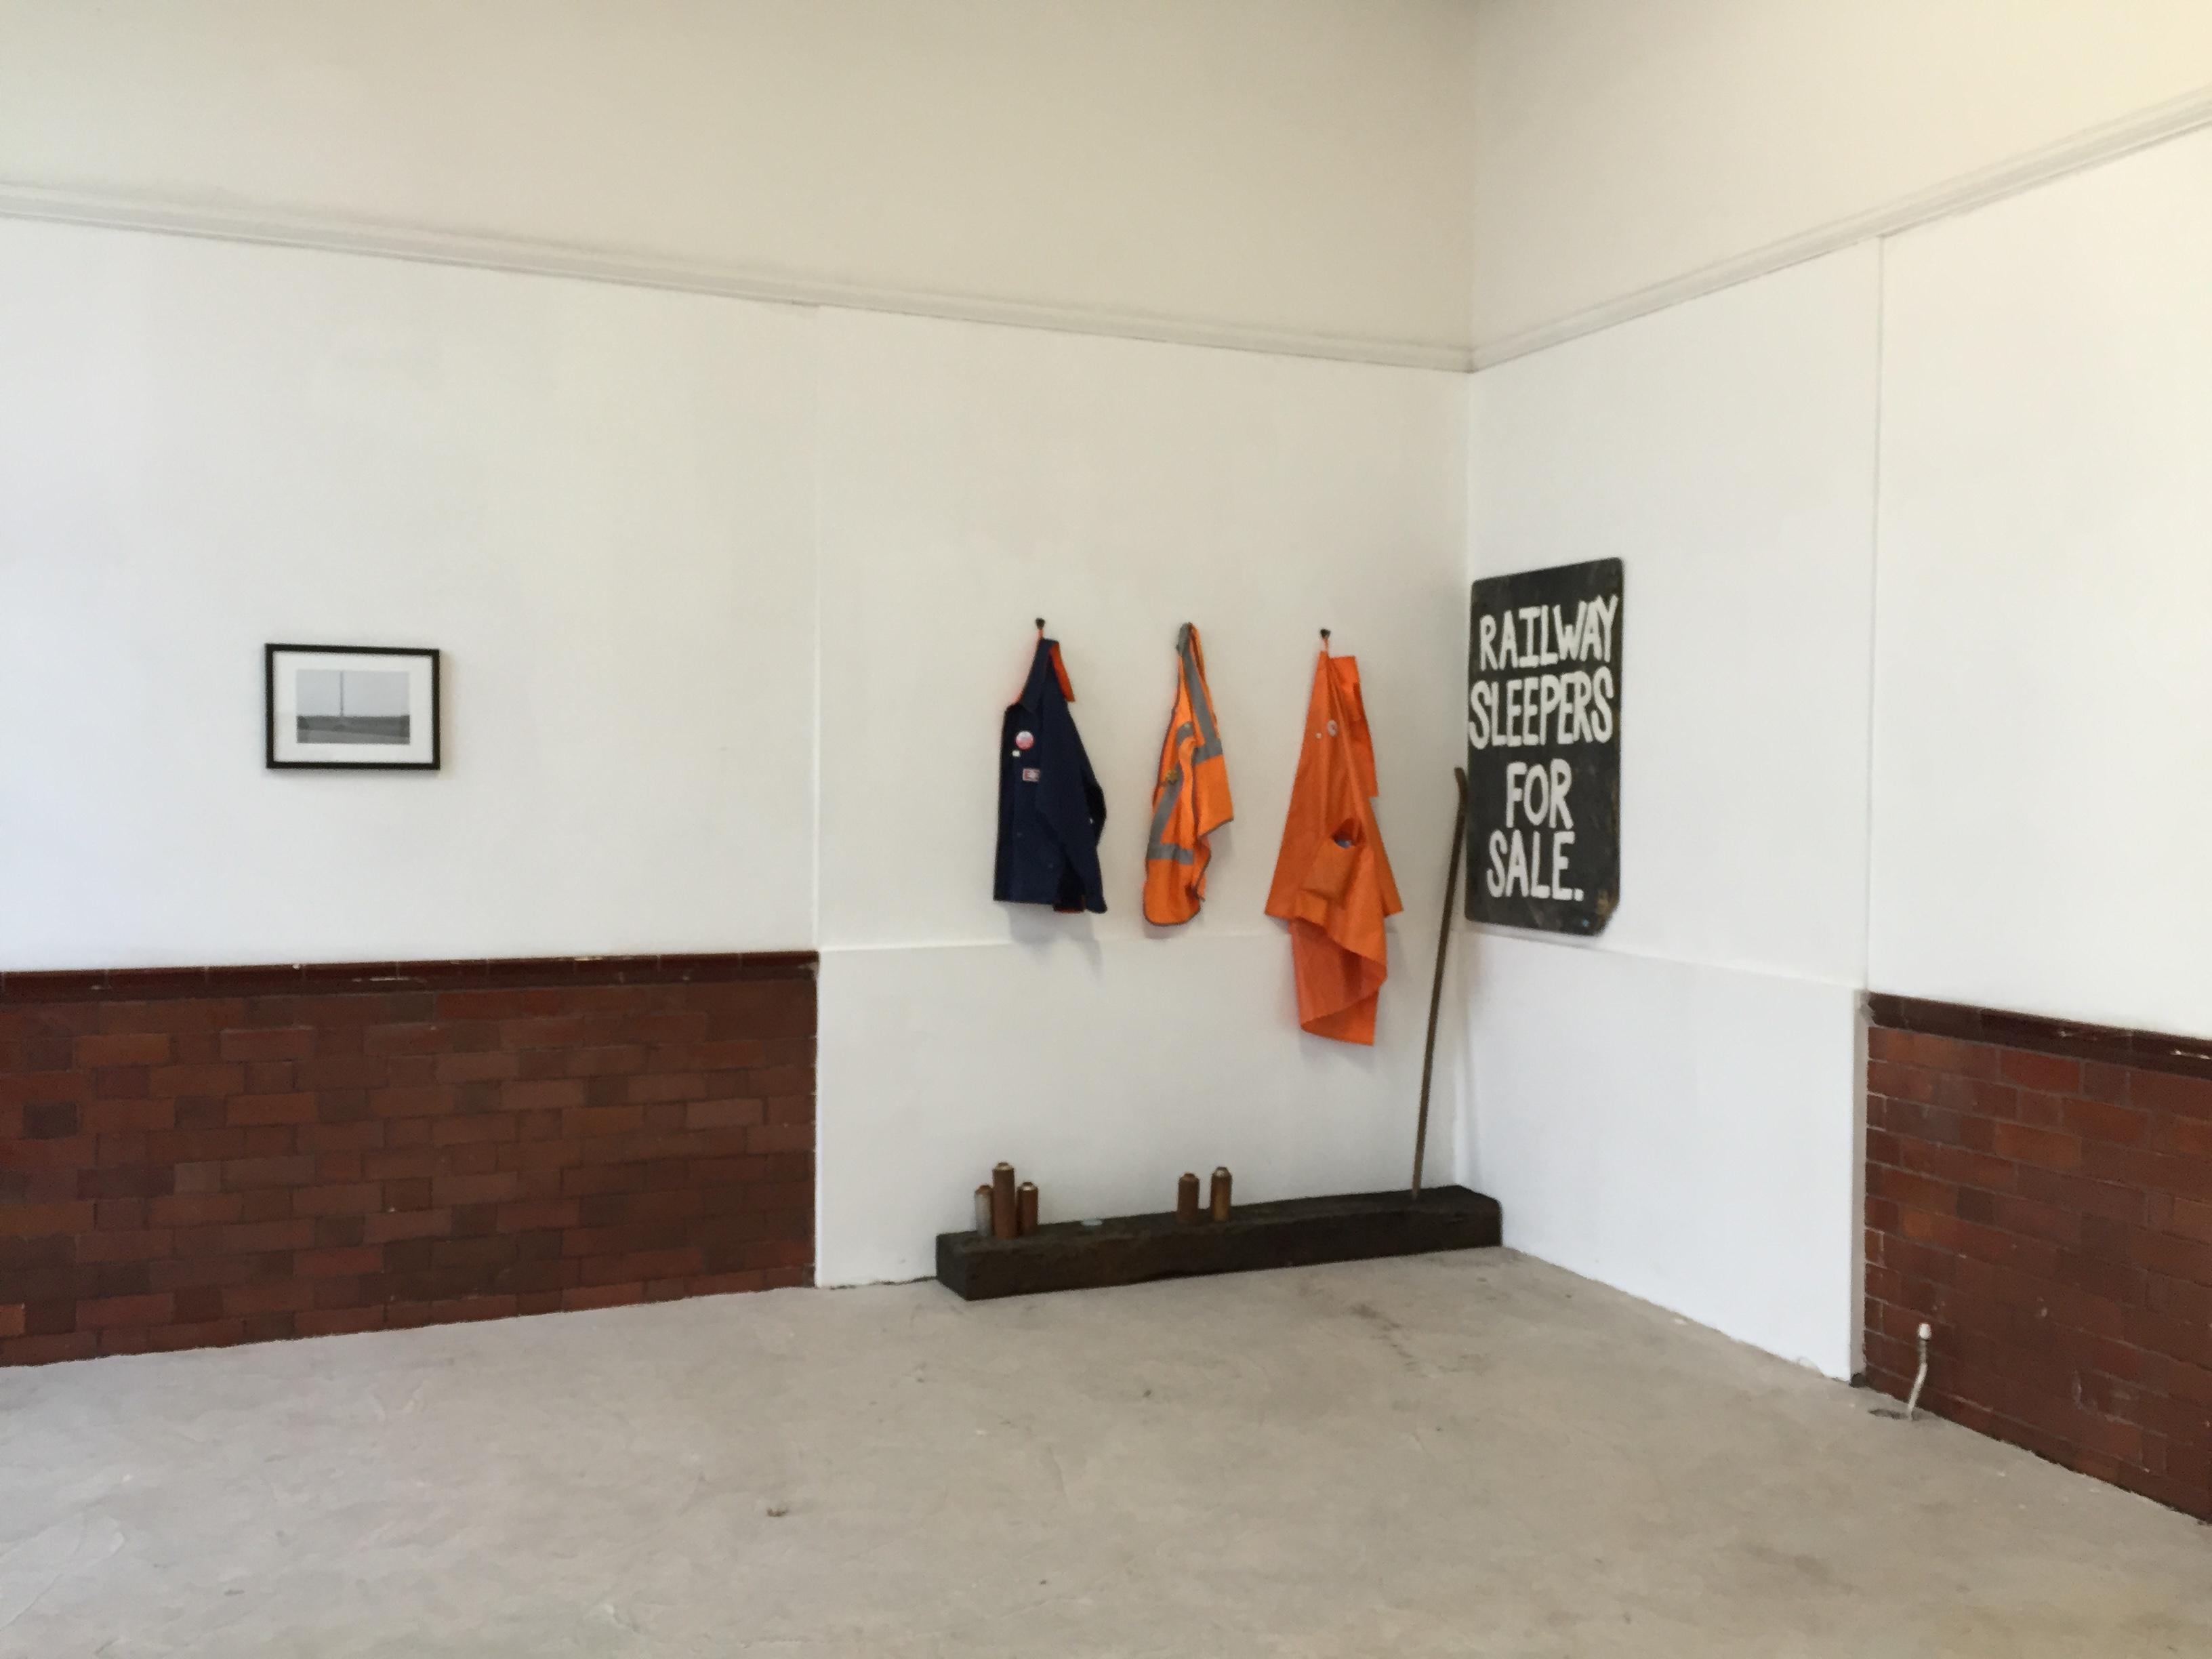 Art exhibition in Victoria Station